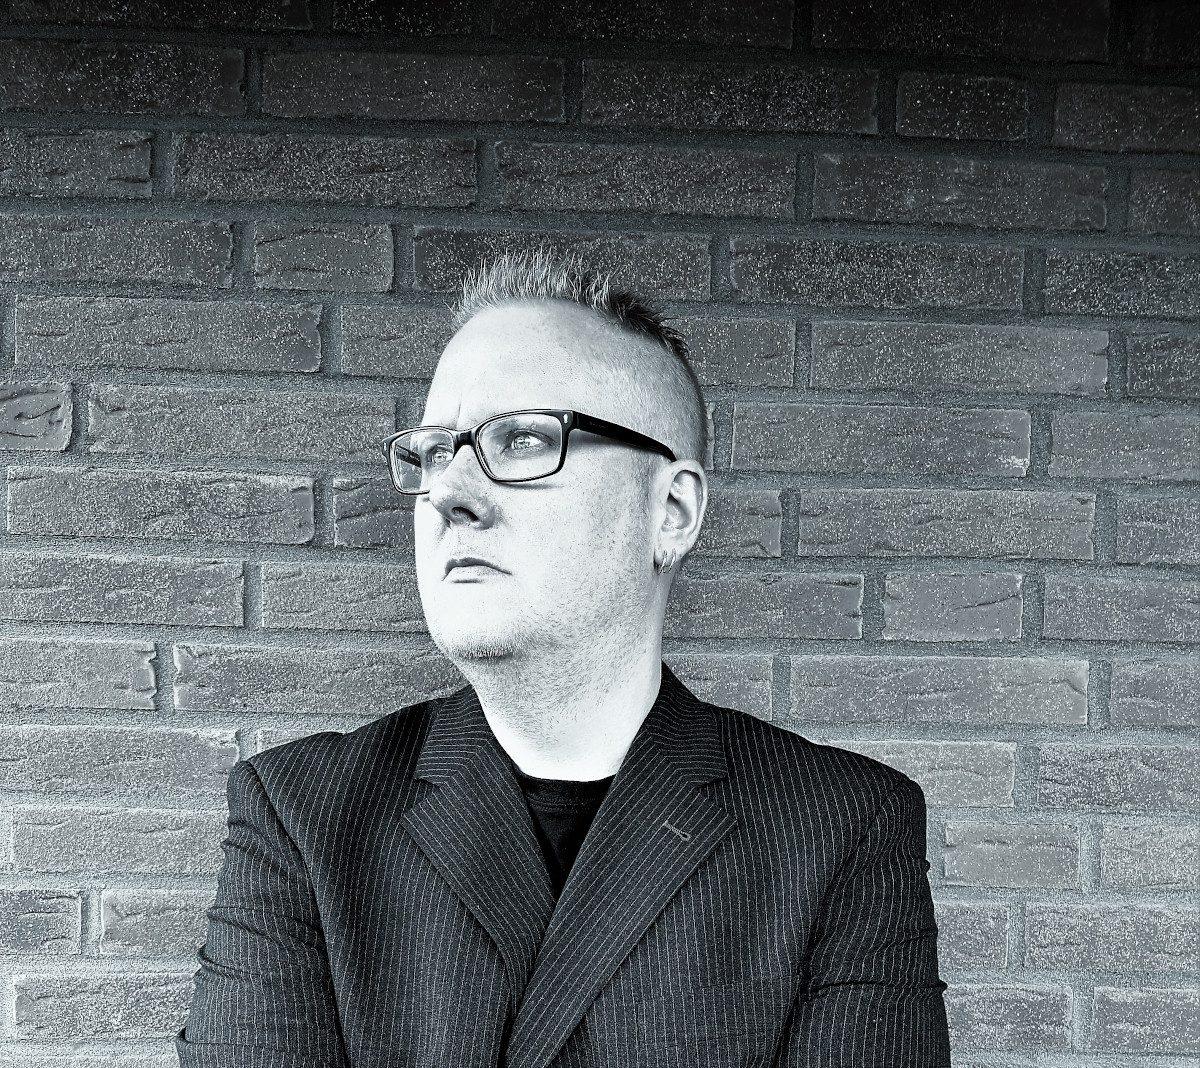 Elektrostaub invites Patrik Hansson of Swedish Electropop band Vanguard on brand new EP 'We Are Dreamers'